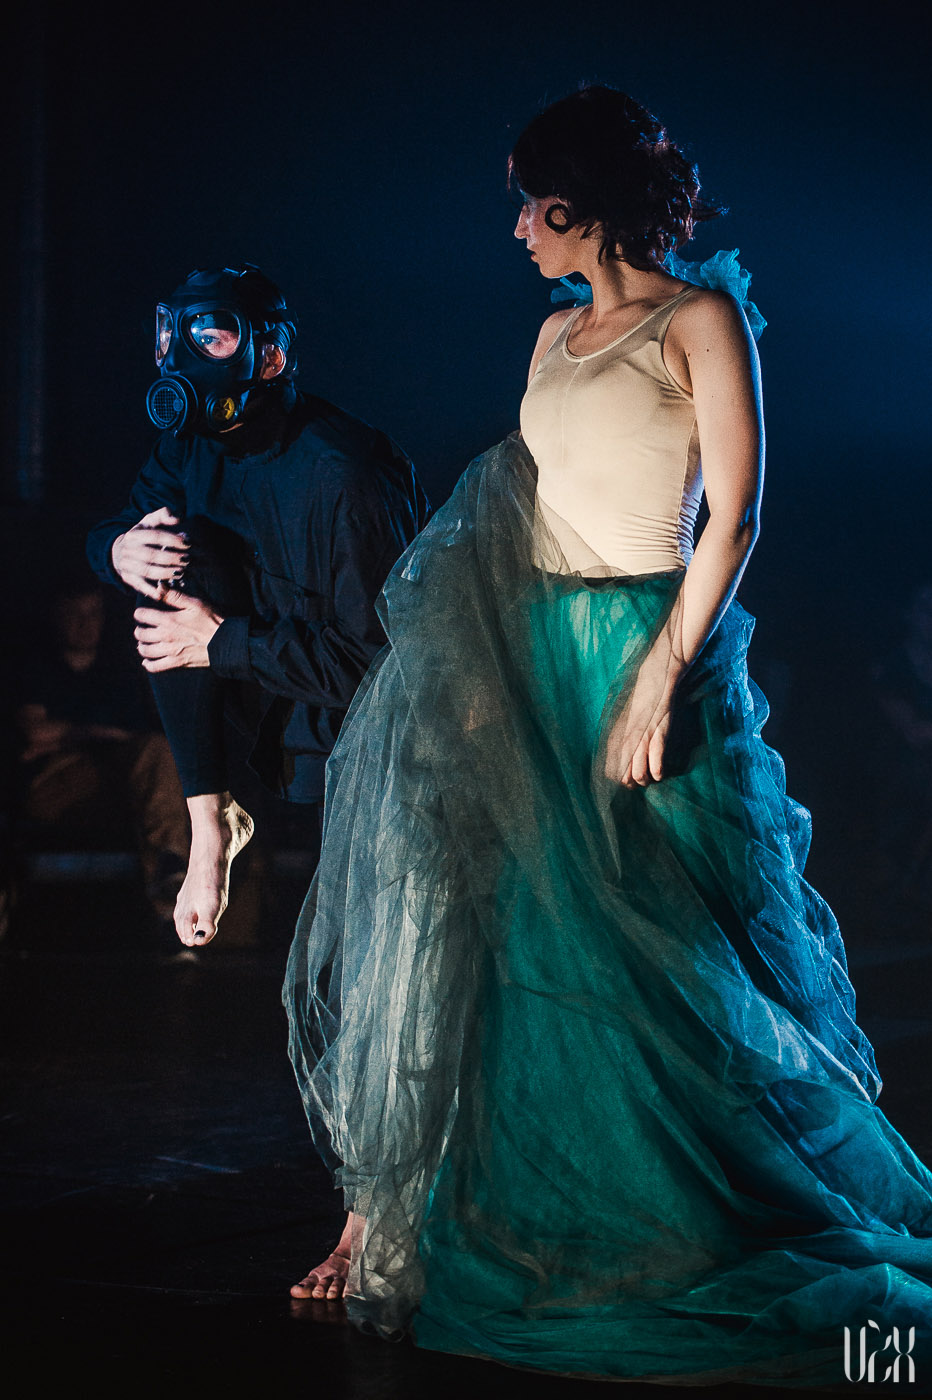 E.sabaliauskaite Vzx.lt Faustas Teatras Event 025